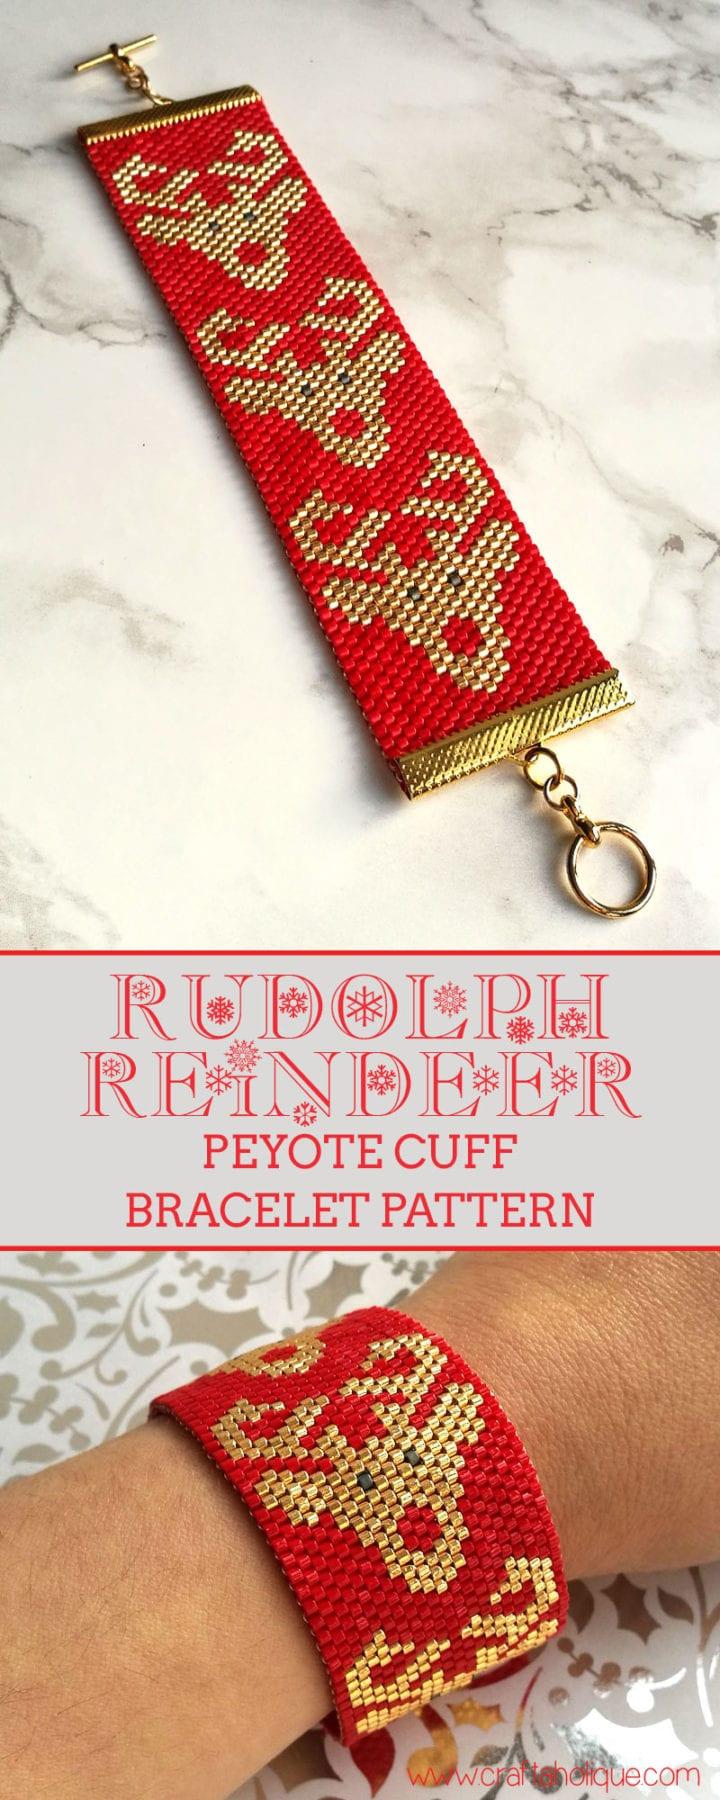 rudolp-reindeer-peyote-stitch-cuff-bracelet-pattern-christmas-beading